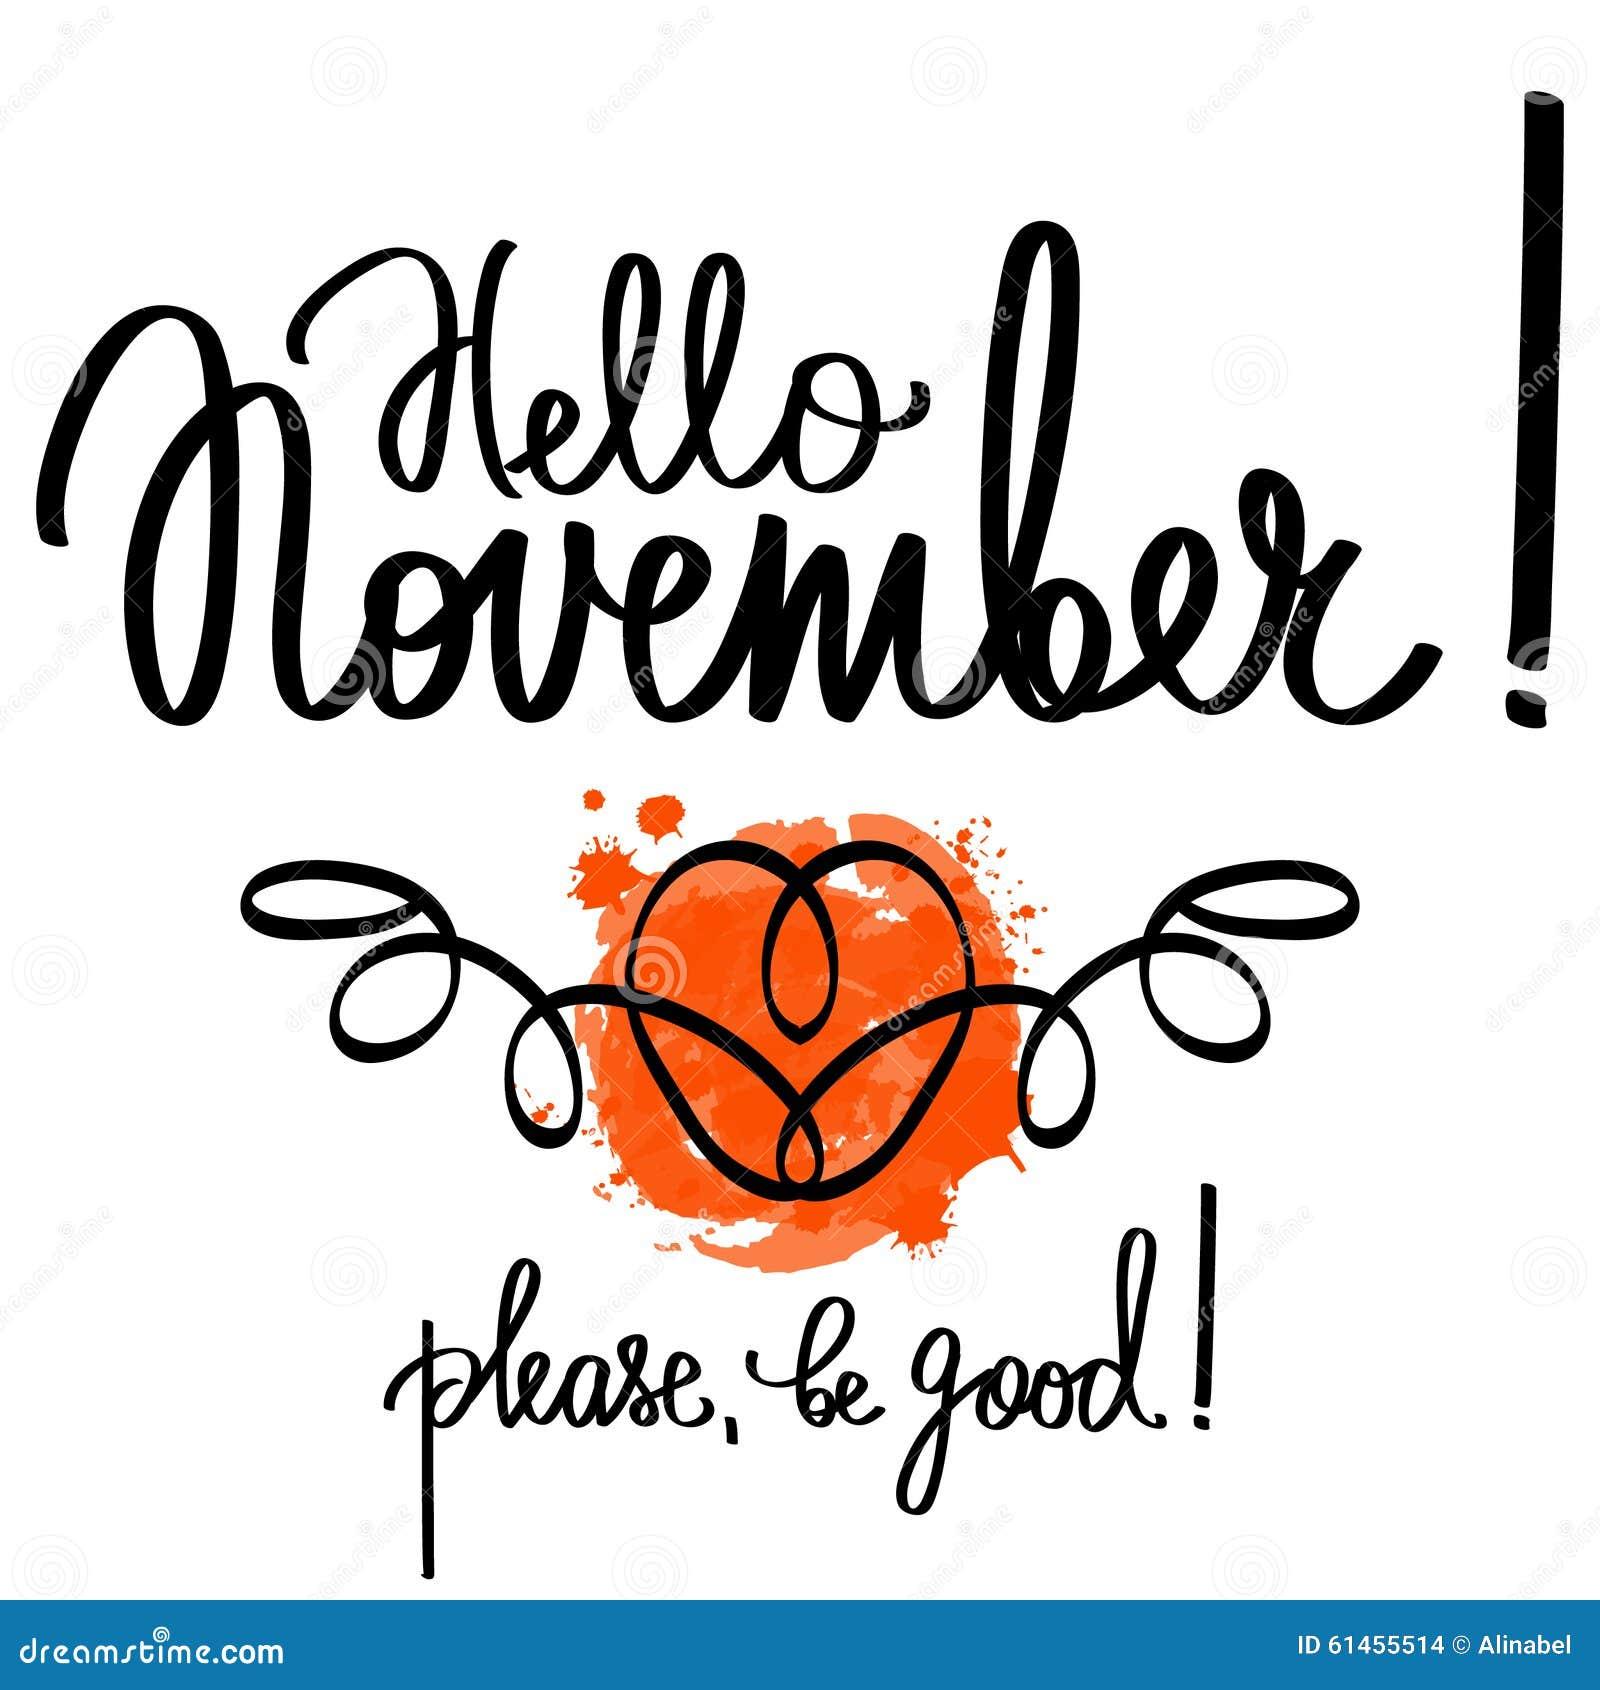 Handmade vector calligraphy and text hello november stock